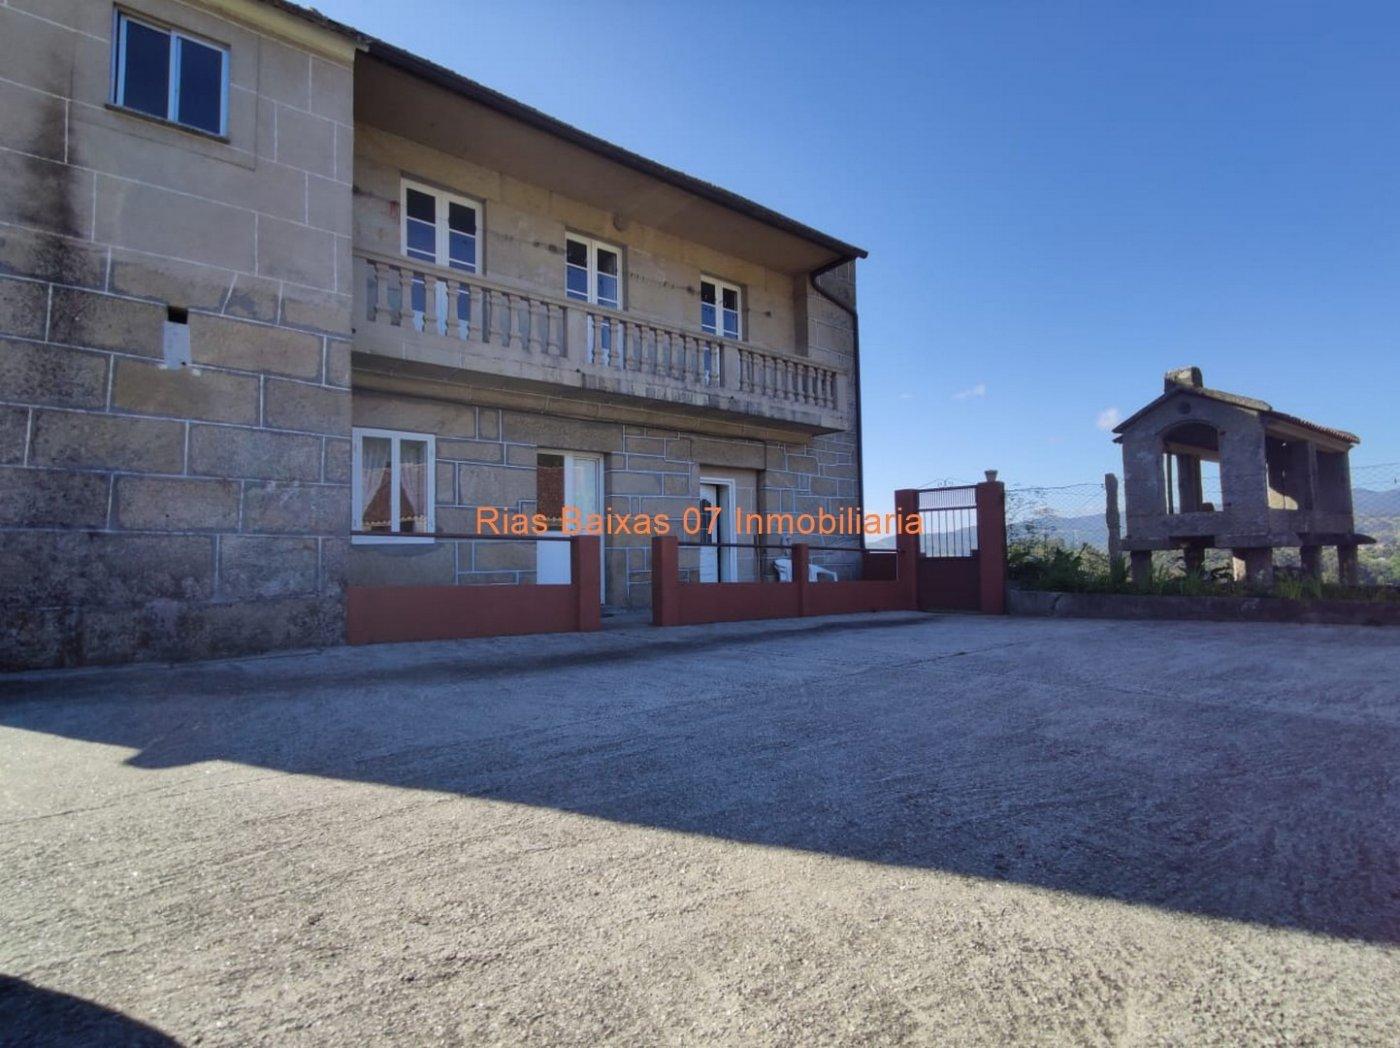 Apartamento, O viso, Venta - Redondela (Pontevedra)